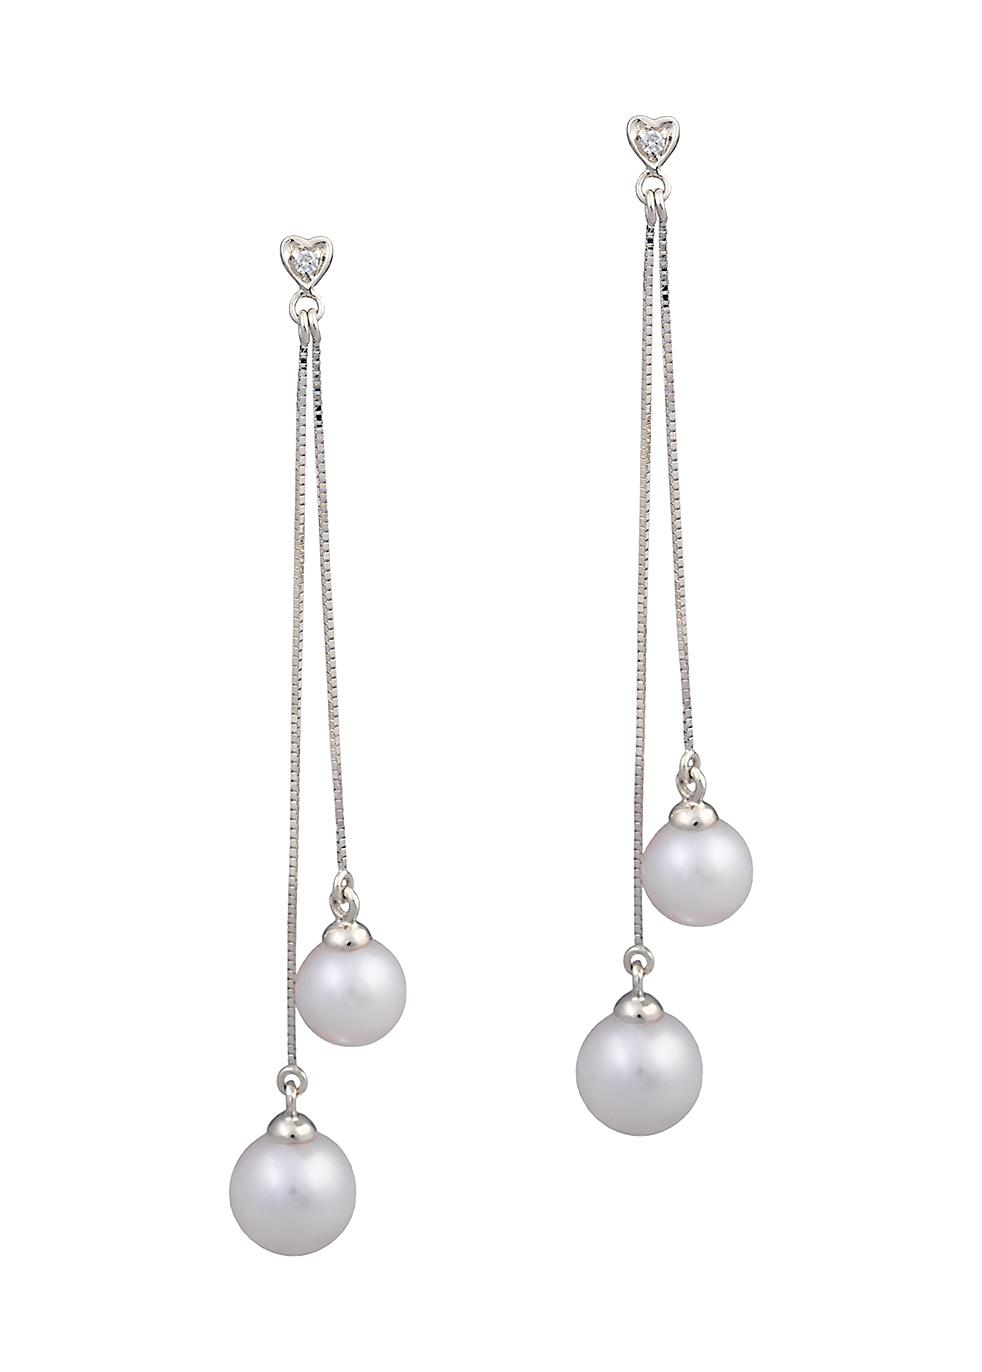 KOJIS White Pearl Tassle Earrings